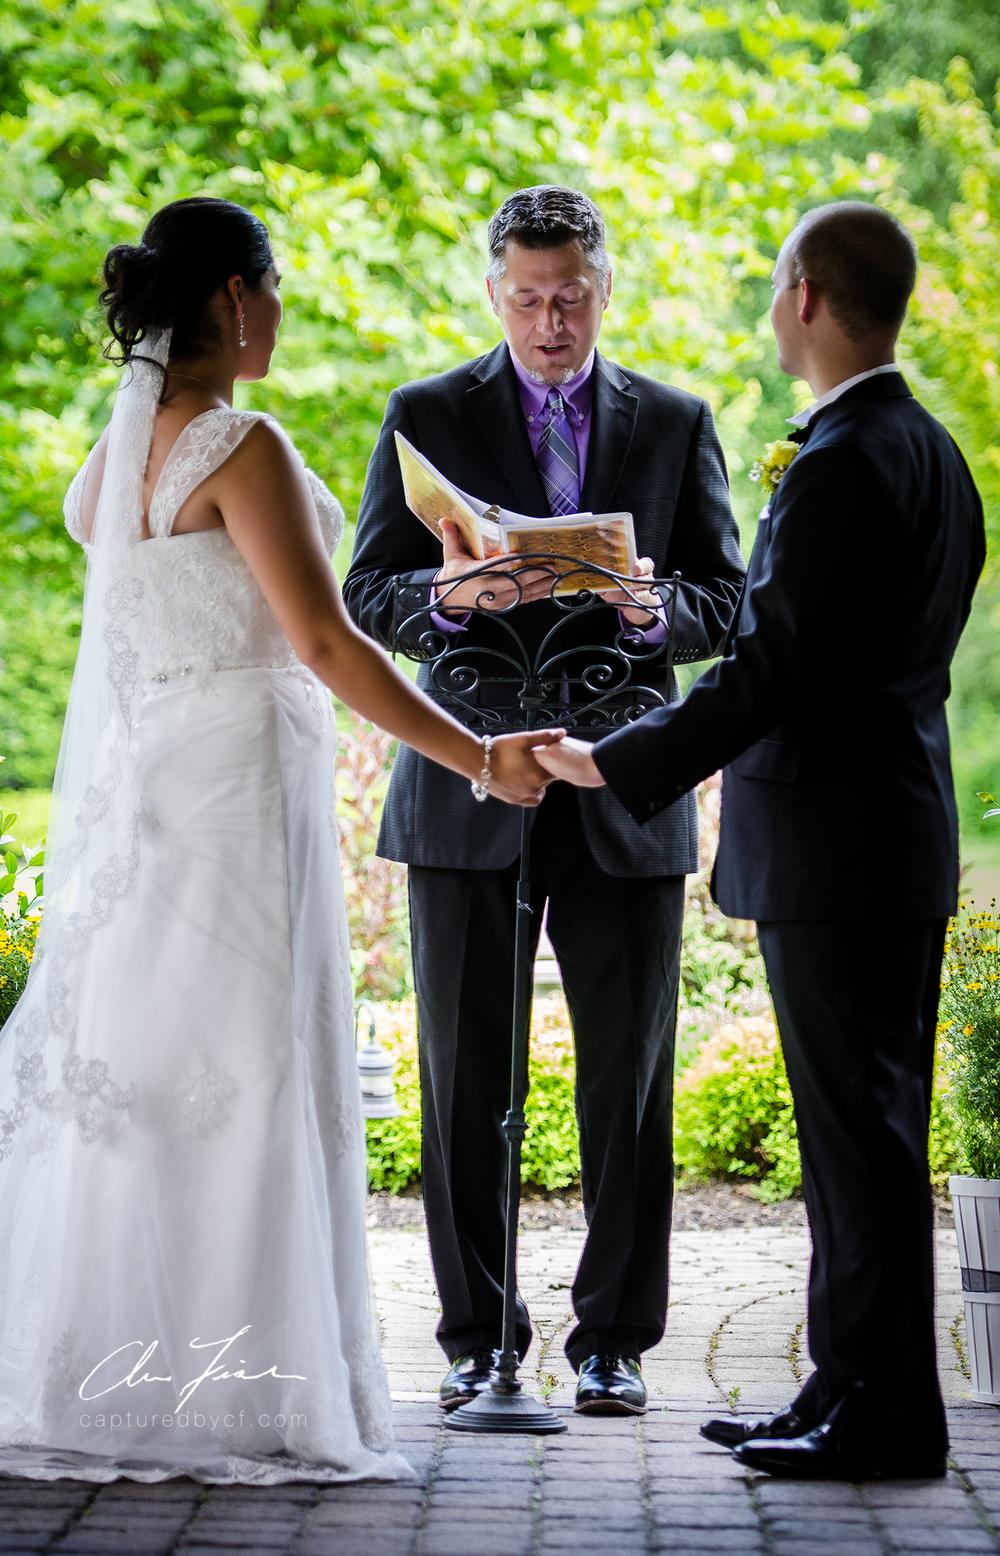 CFPhoto-Wedding-1-7.jpg